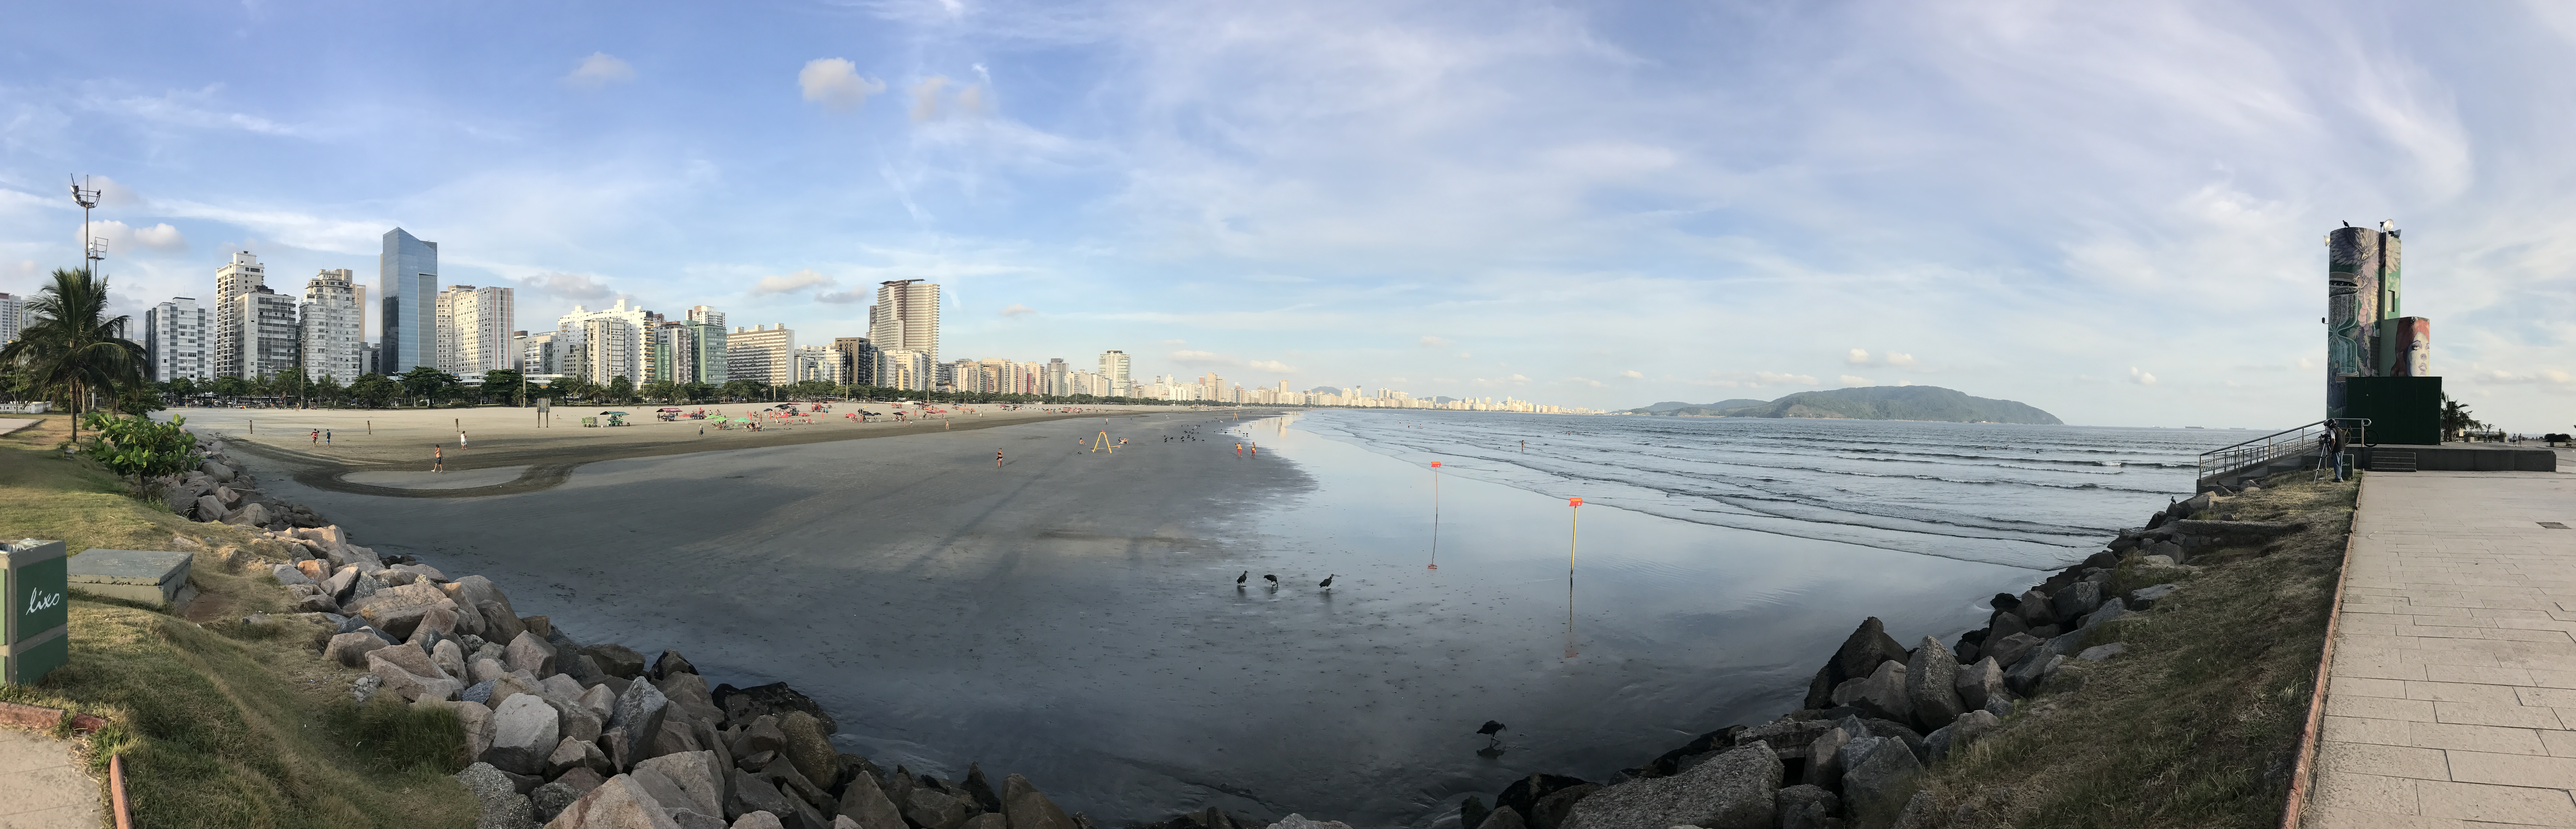 santos, praia, são Paulo, orla, fotos, tomie ohtake